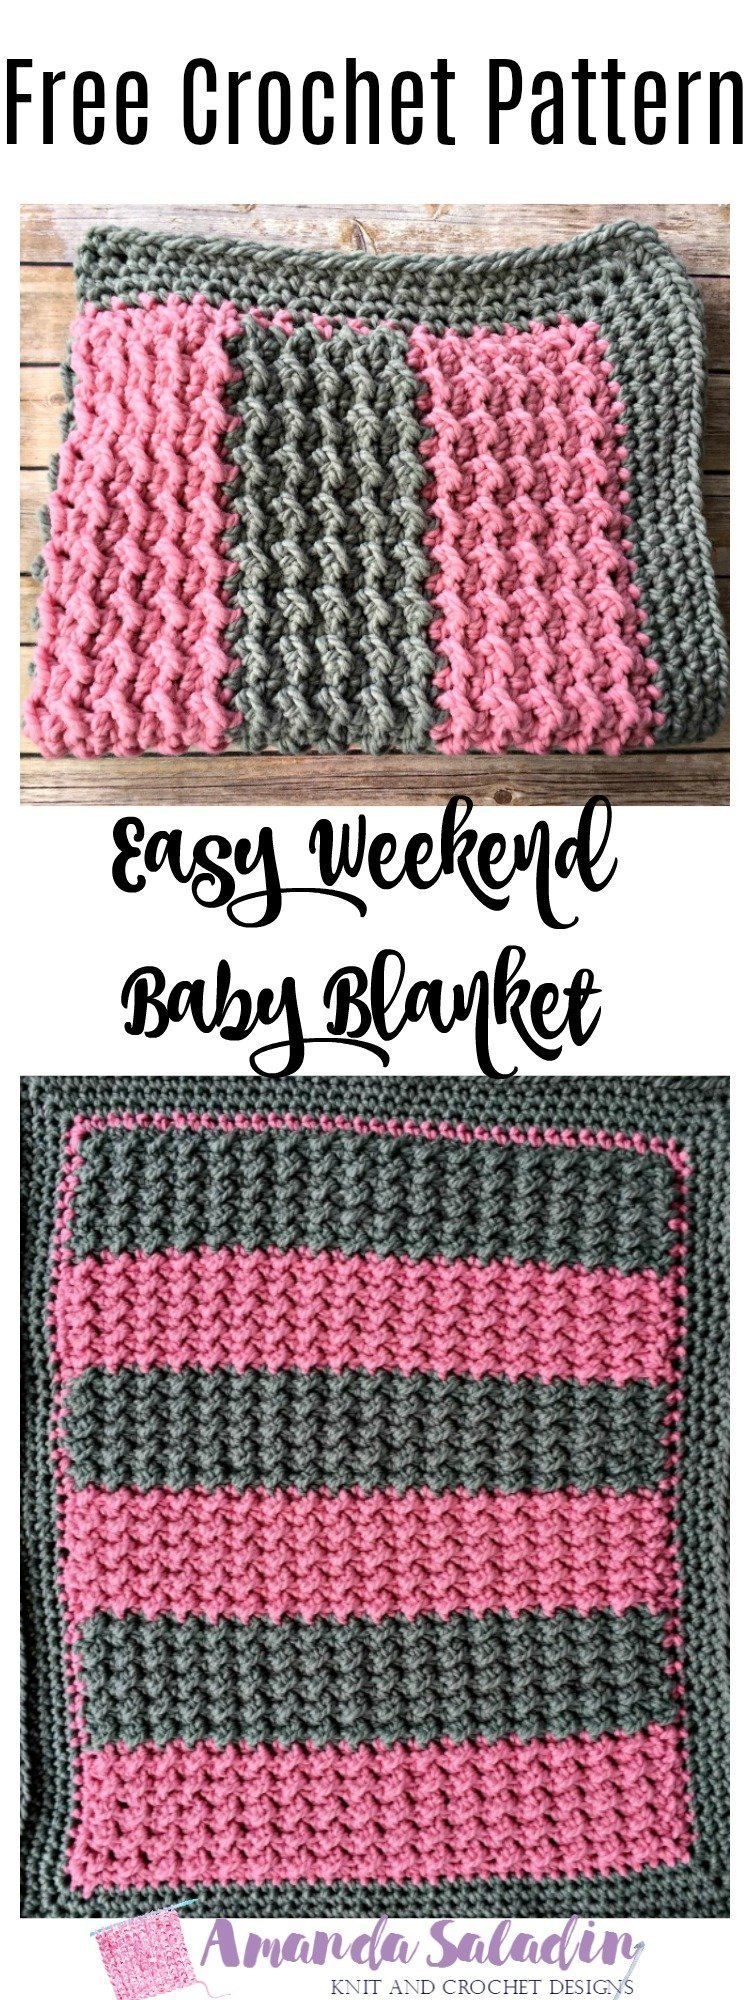 Free Crochet Pattern - Easy Weekend Baby Blanket